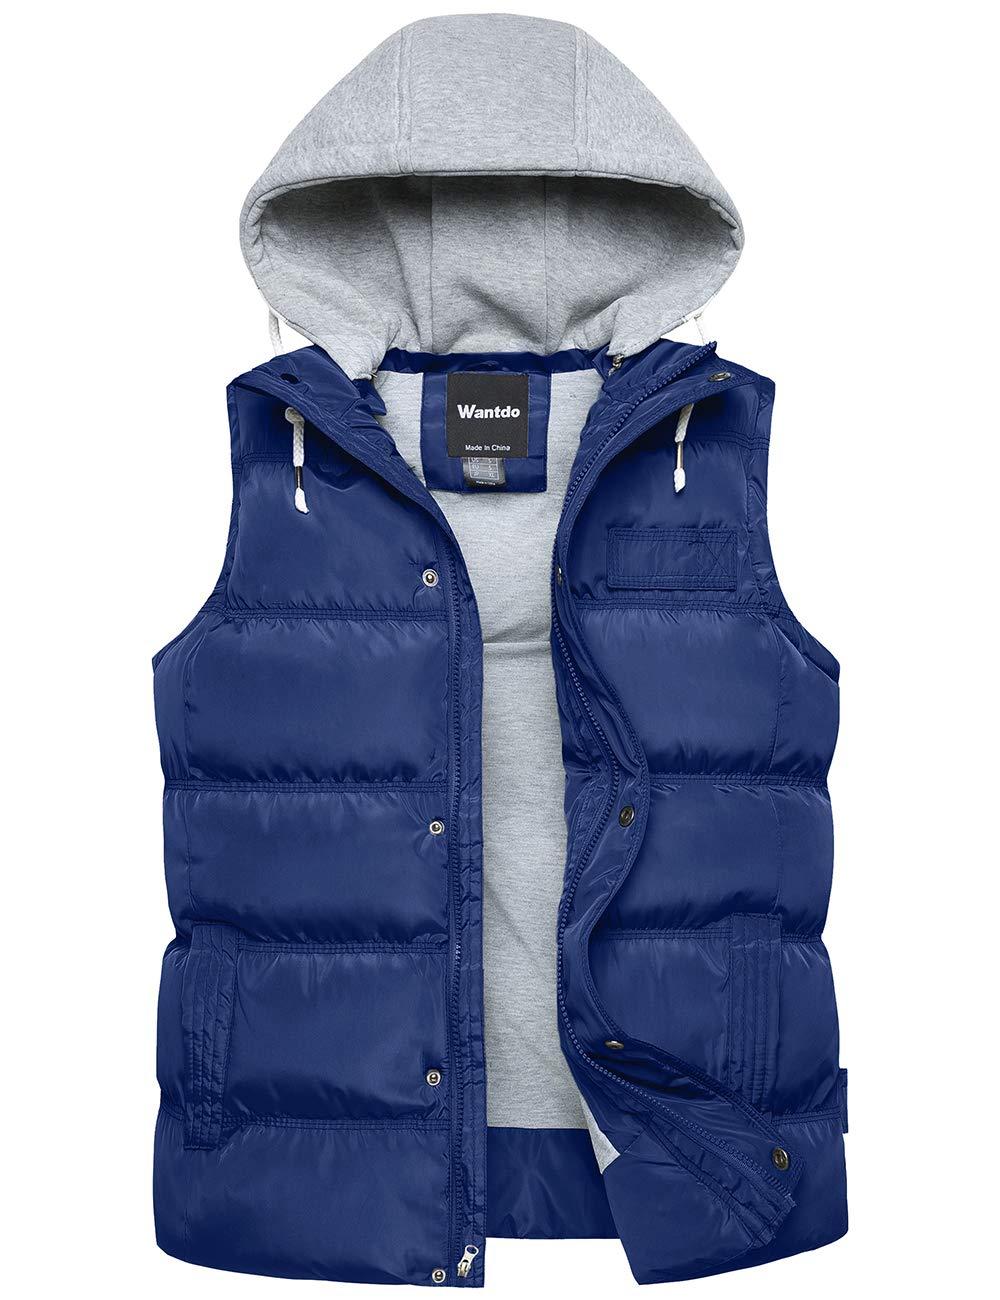 Wantdo Men's Winter Puffer Vest Removable Hood Warm Sleeveless Jacket Gilet